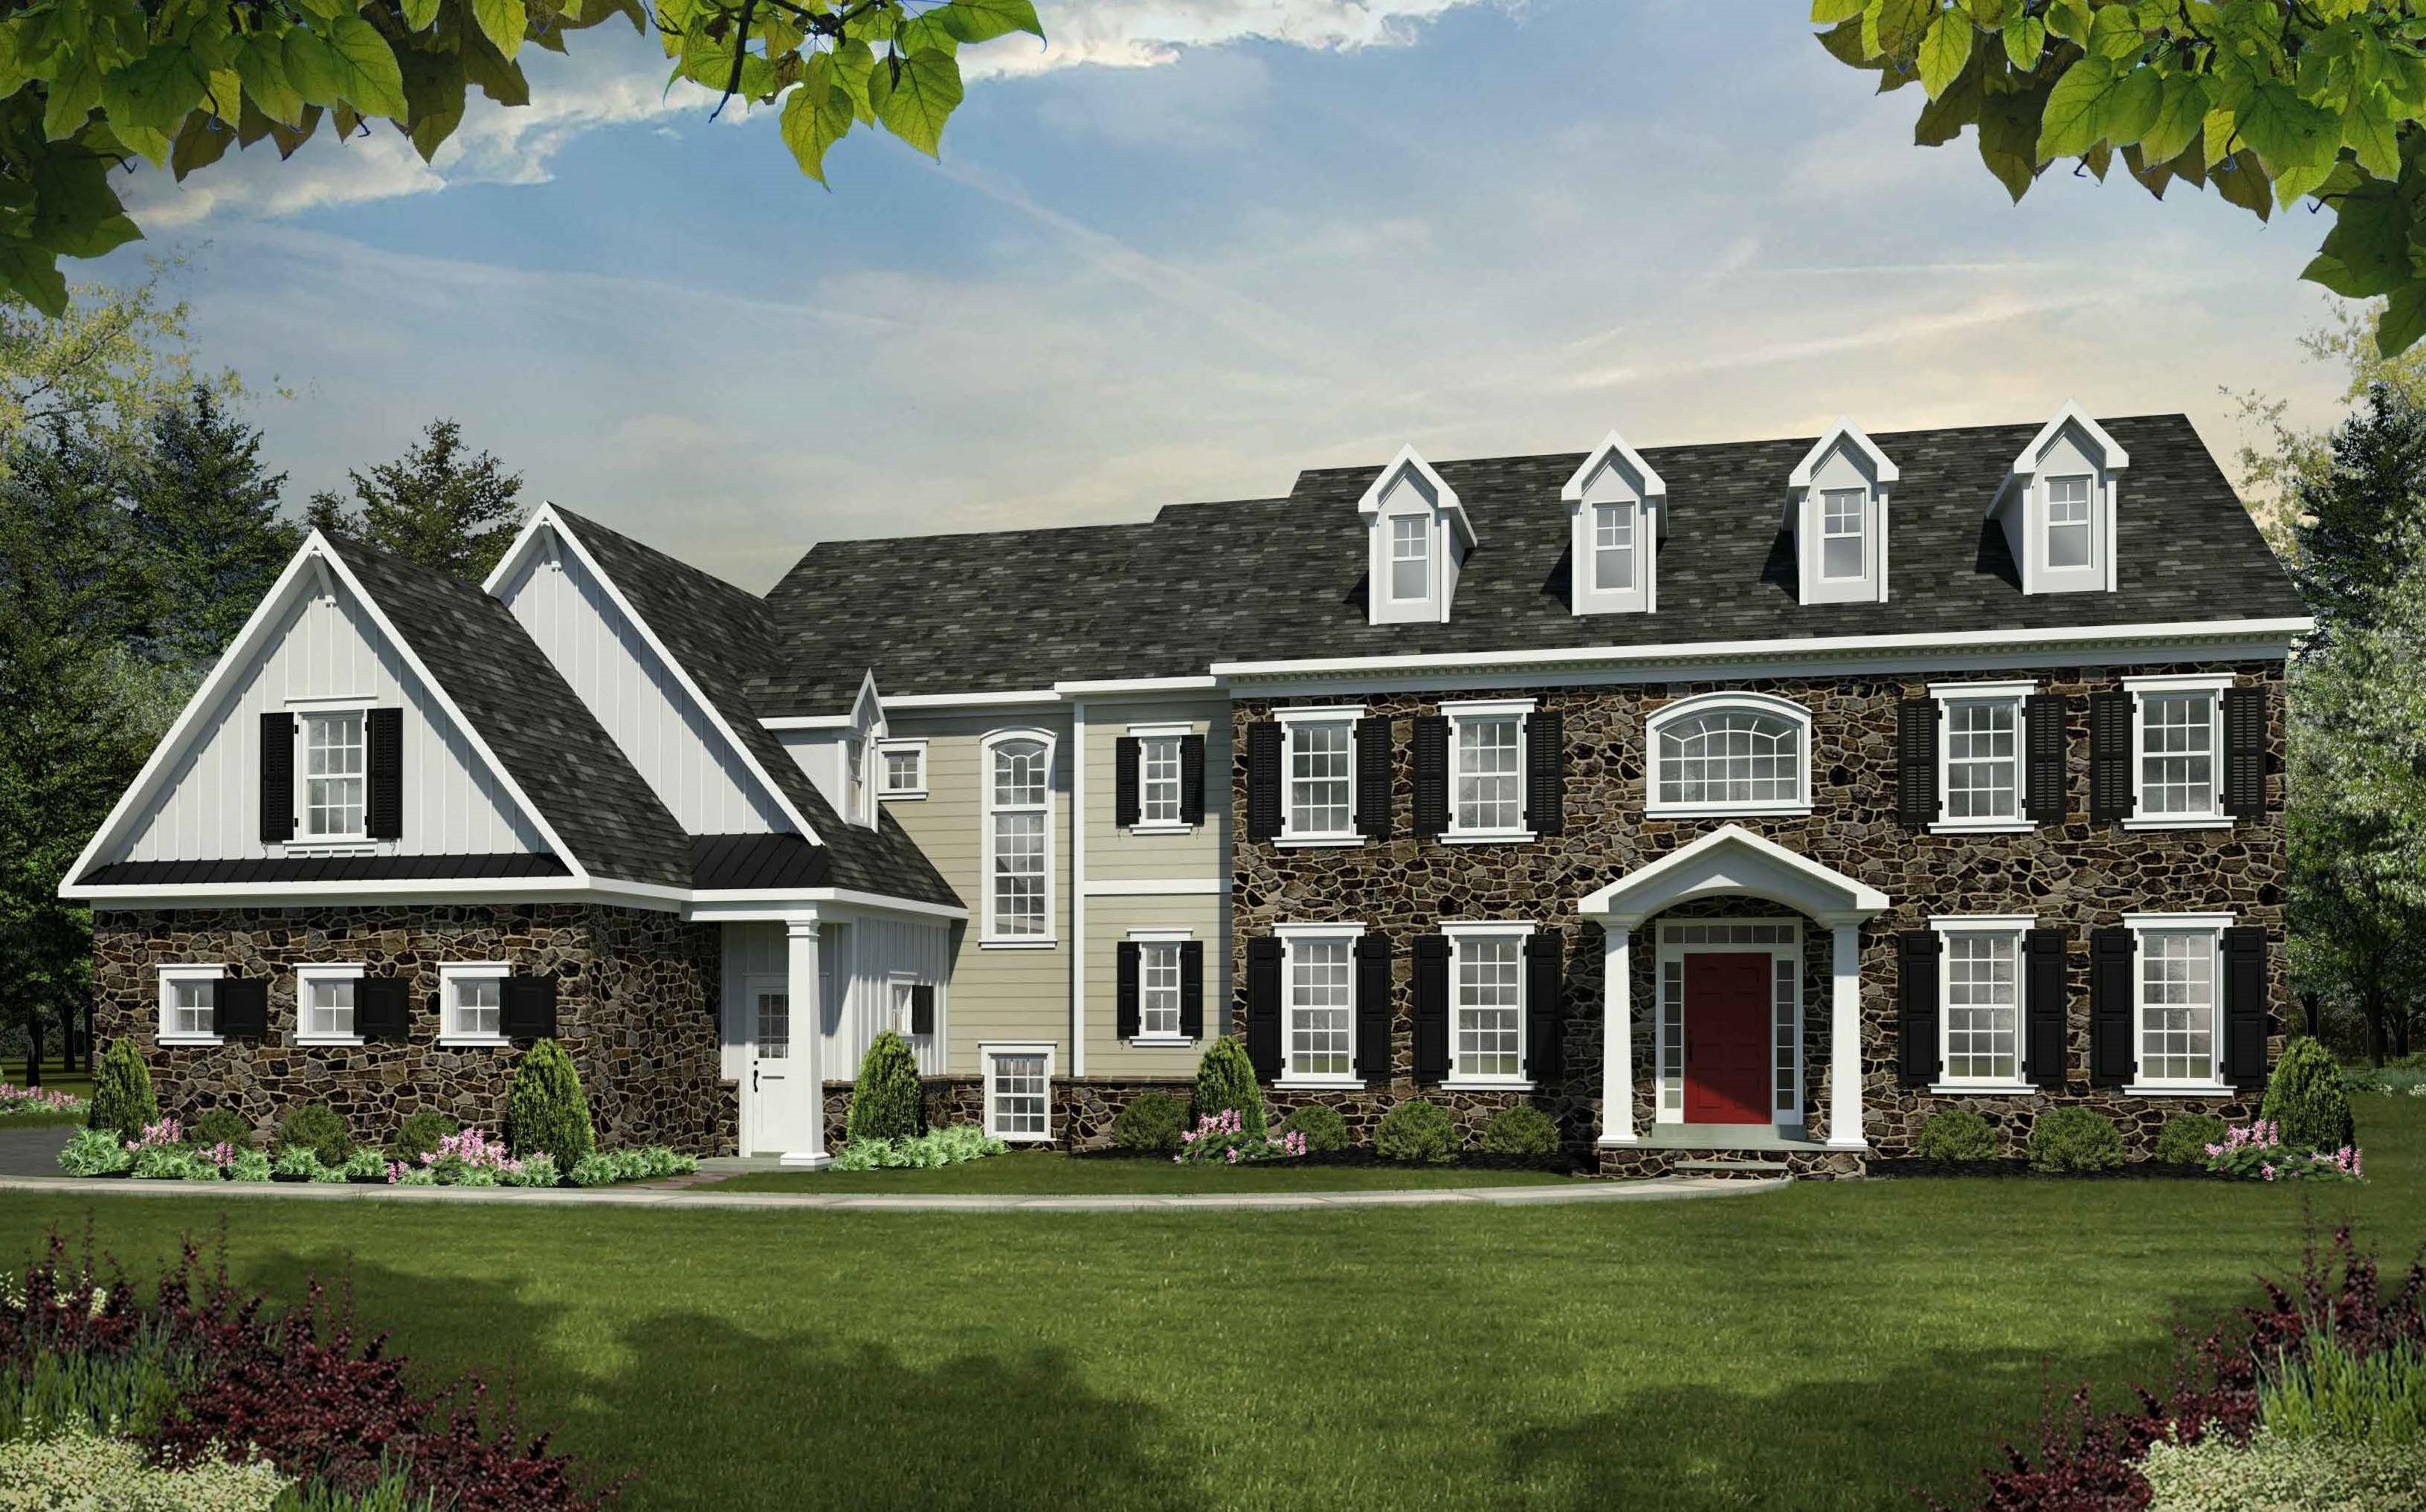 'Gwynedd's Preserve at Prospect' by Cornerstone Premier Homes in Philadelphia